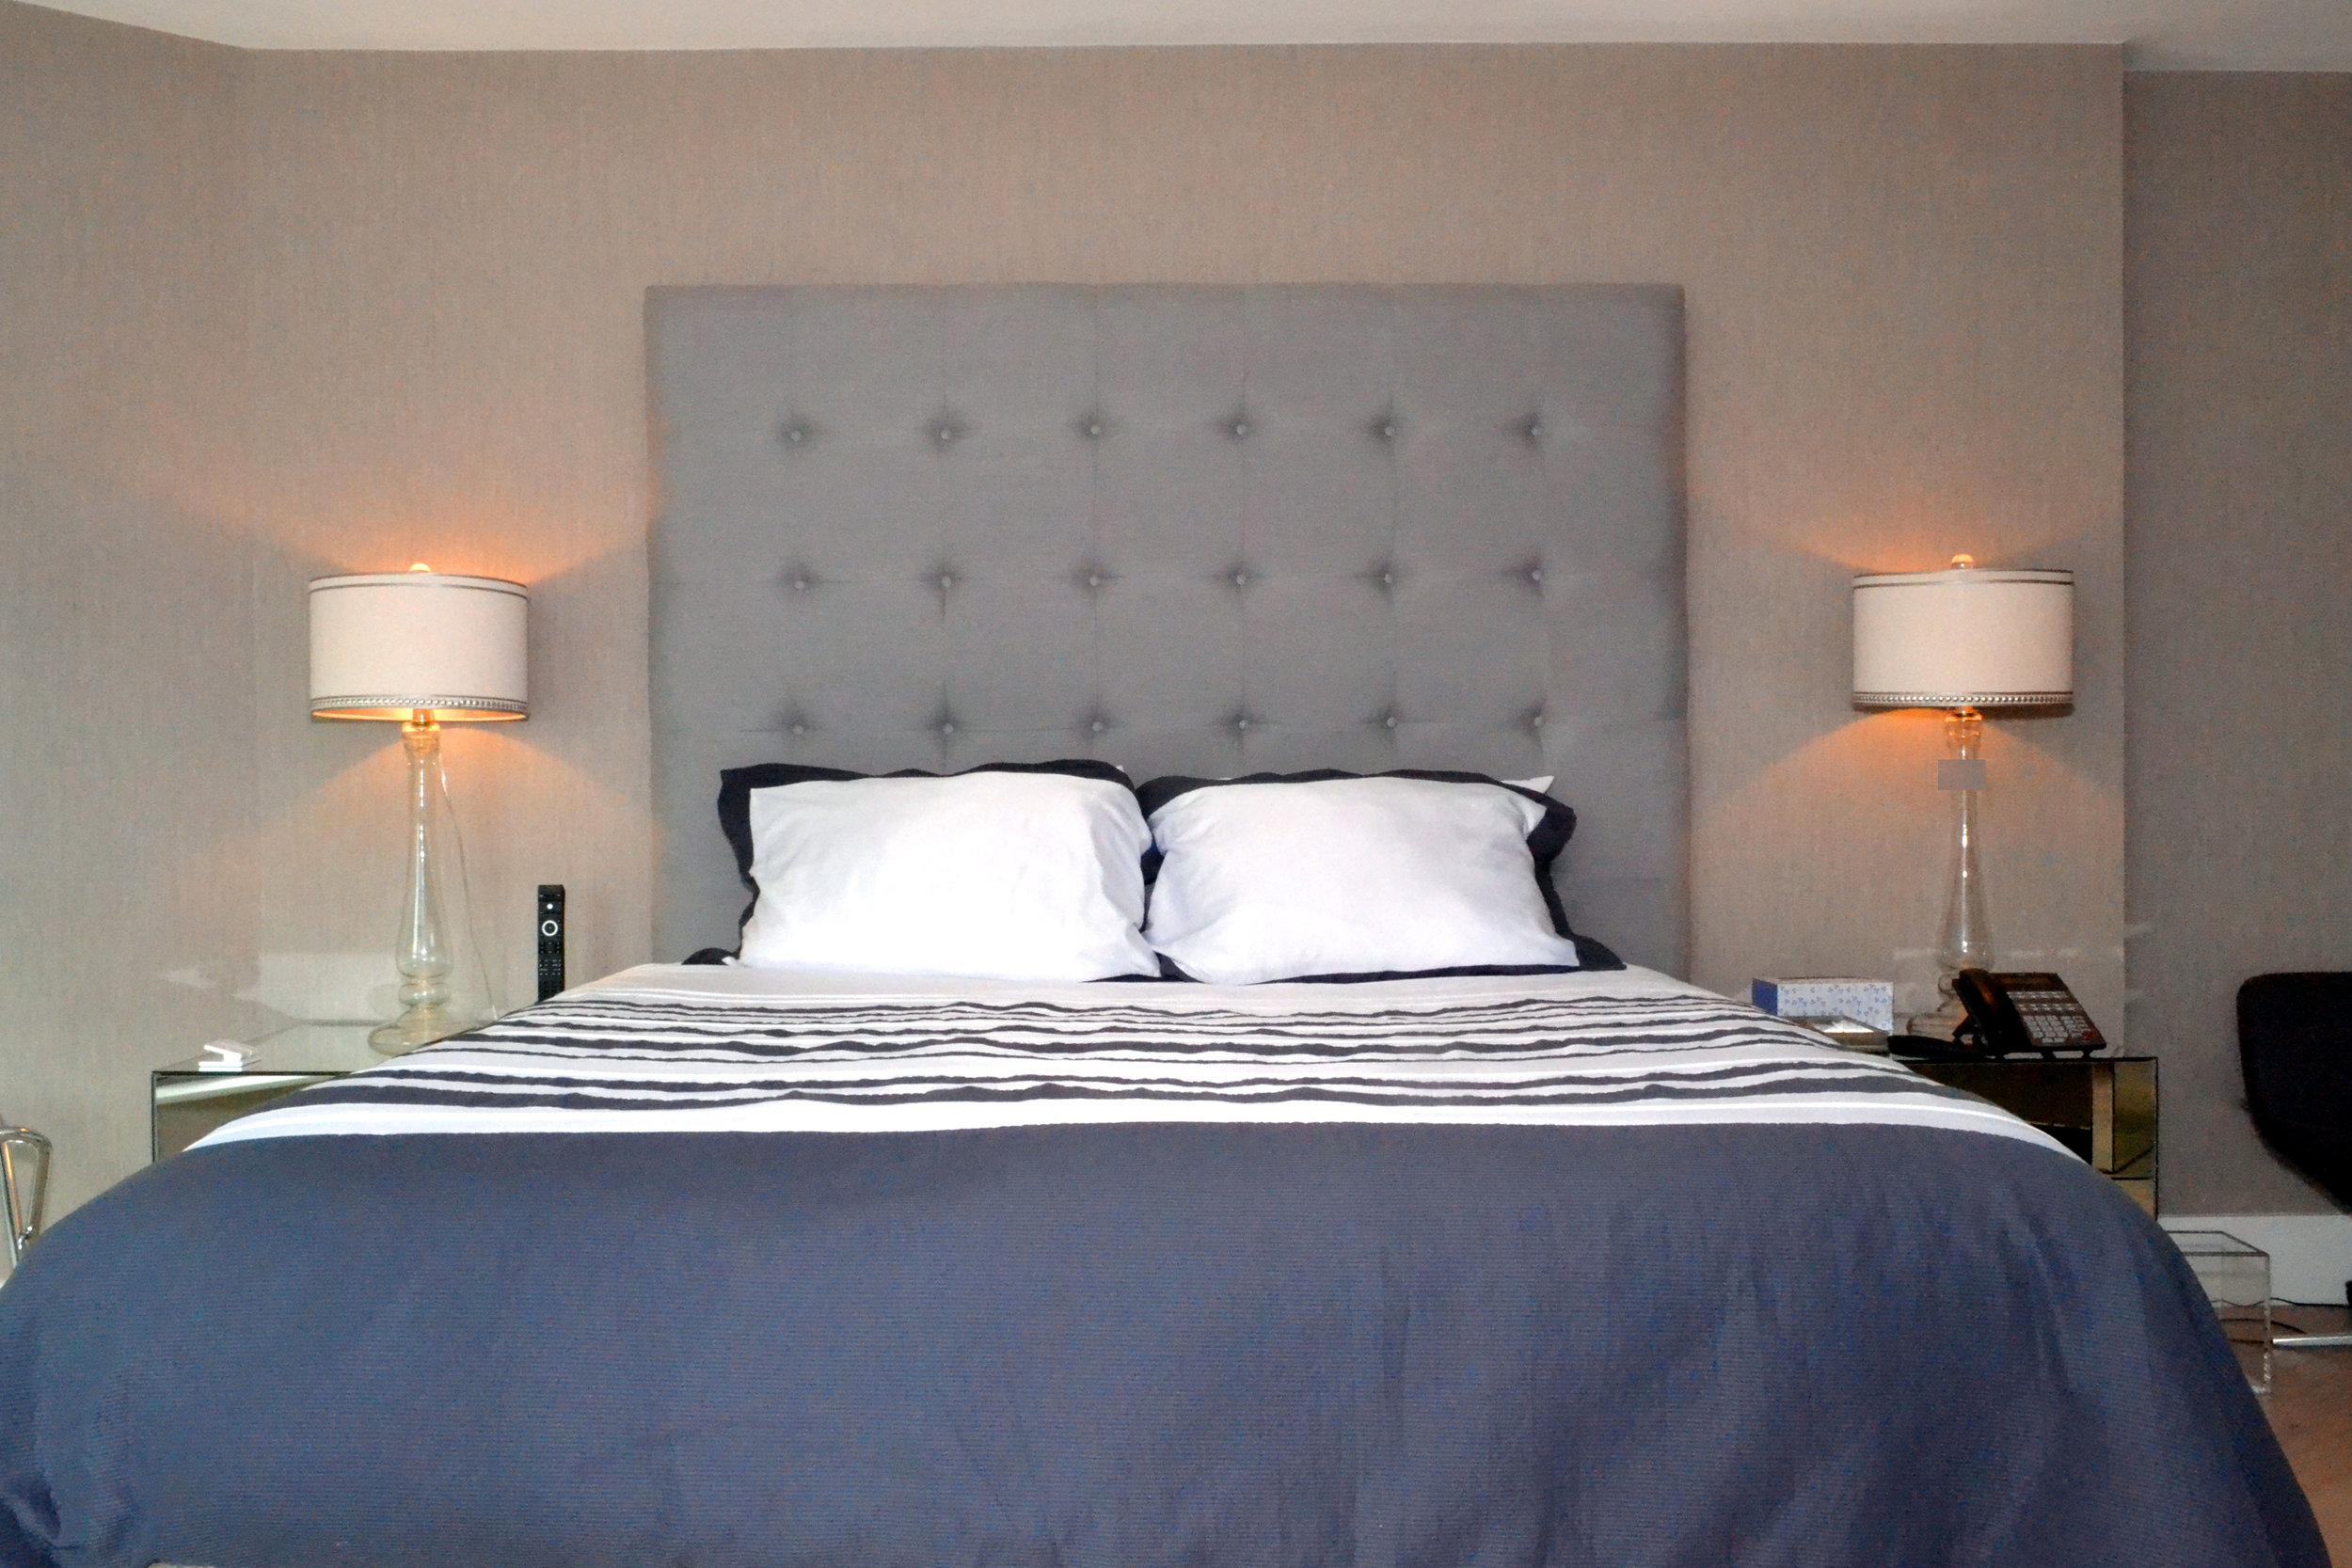 BRG-Bed2-2.jpg